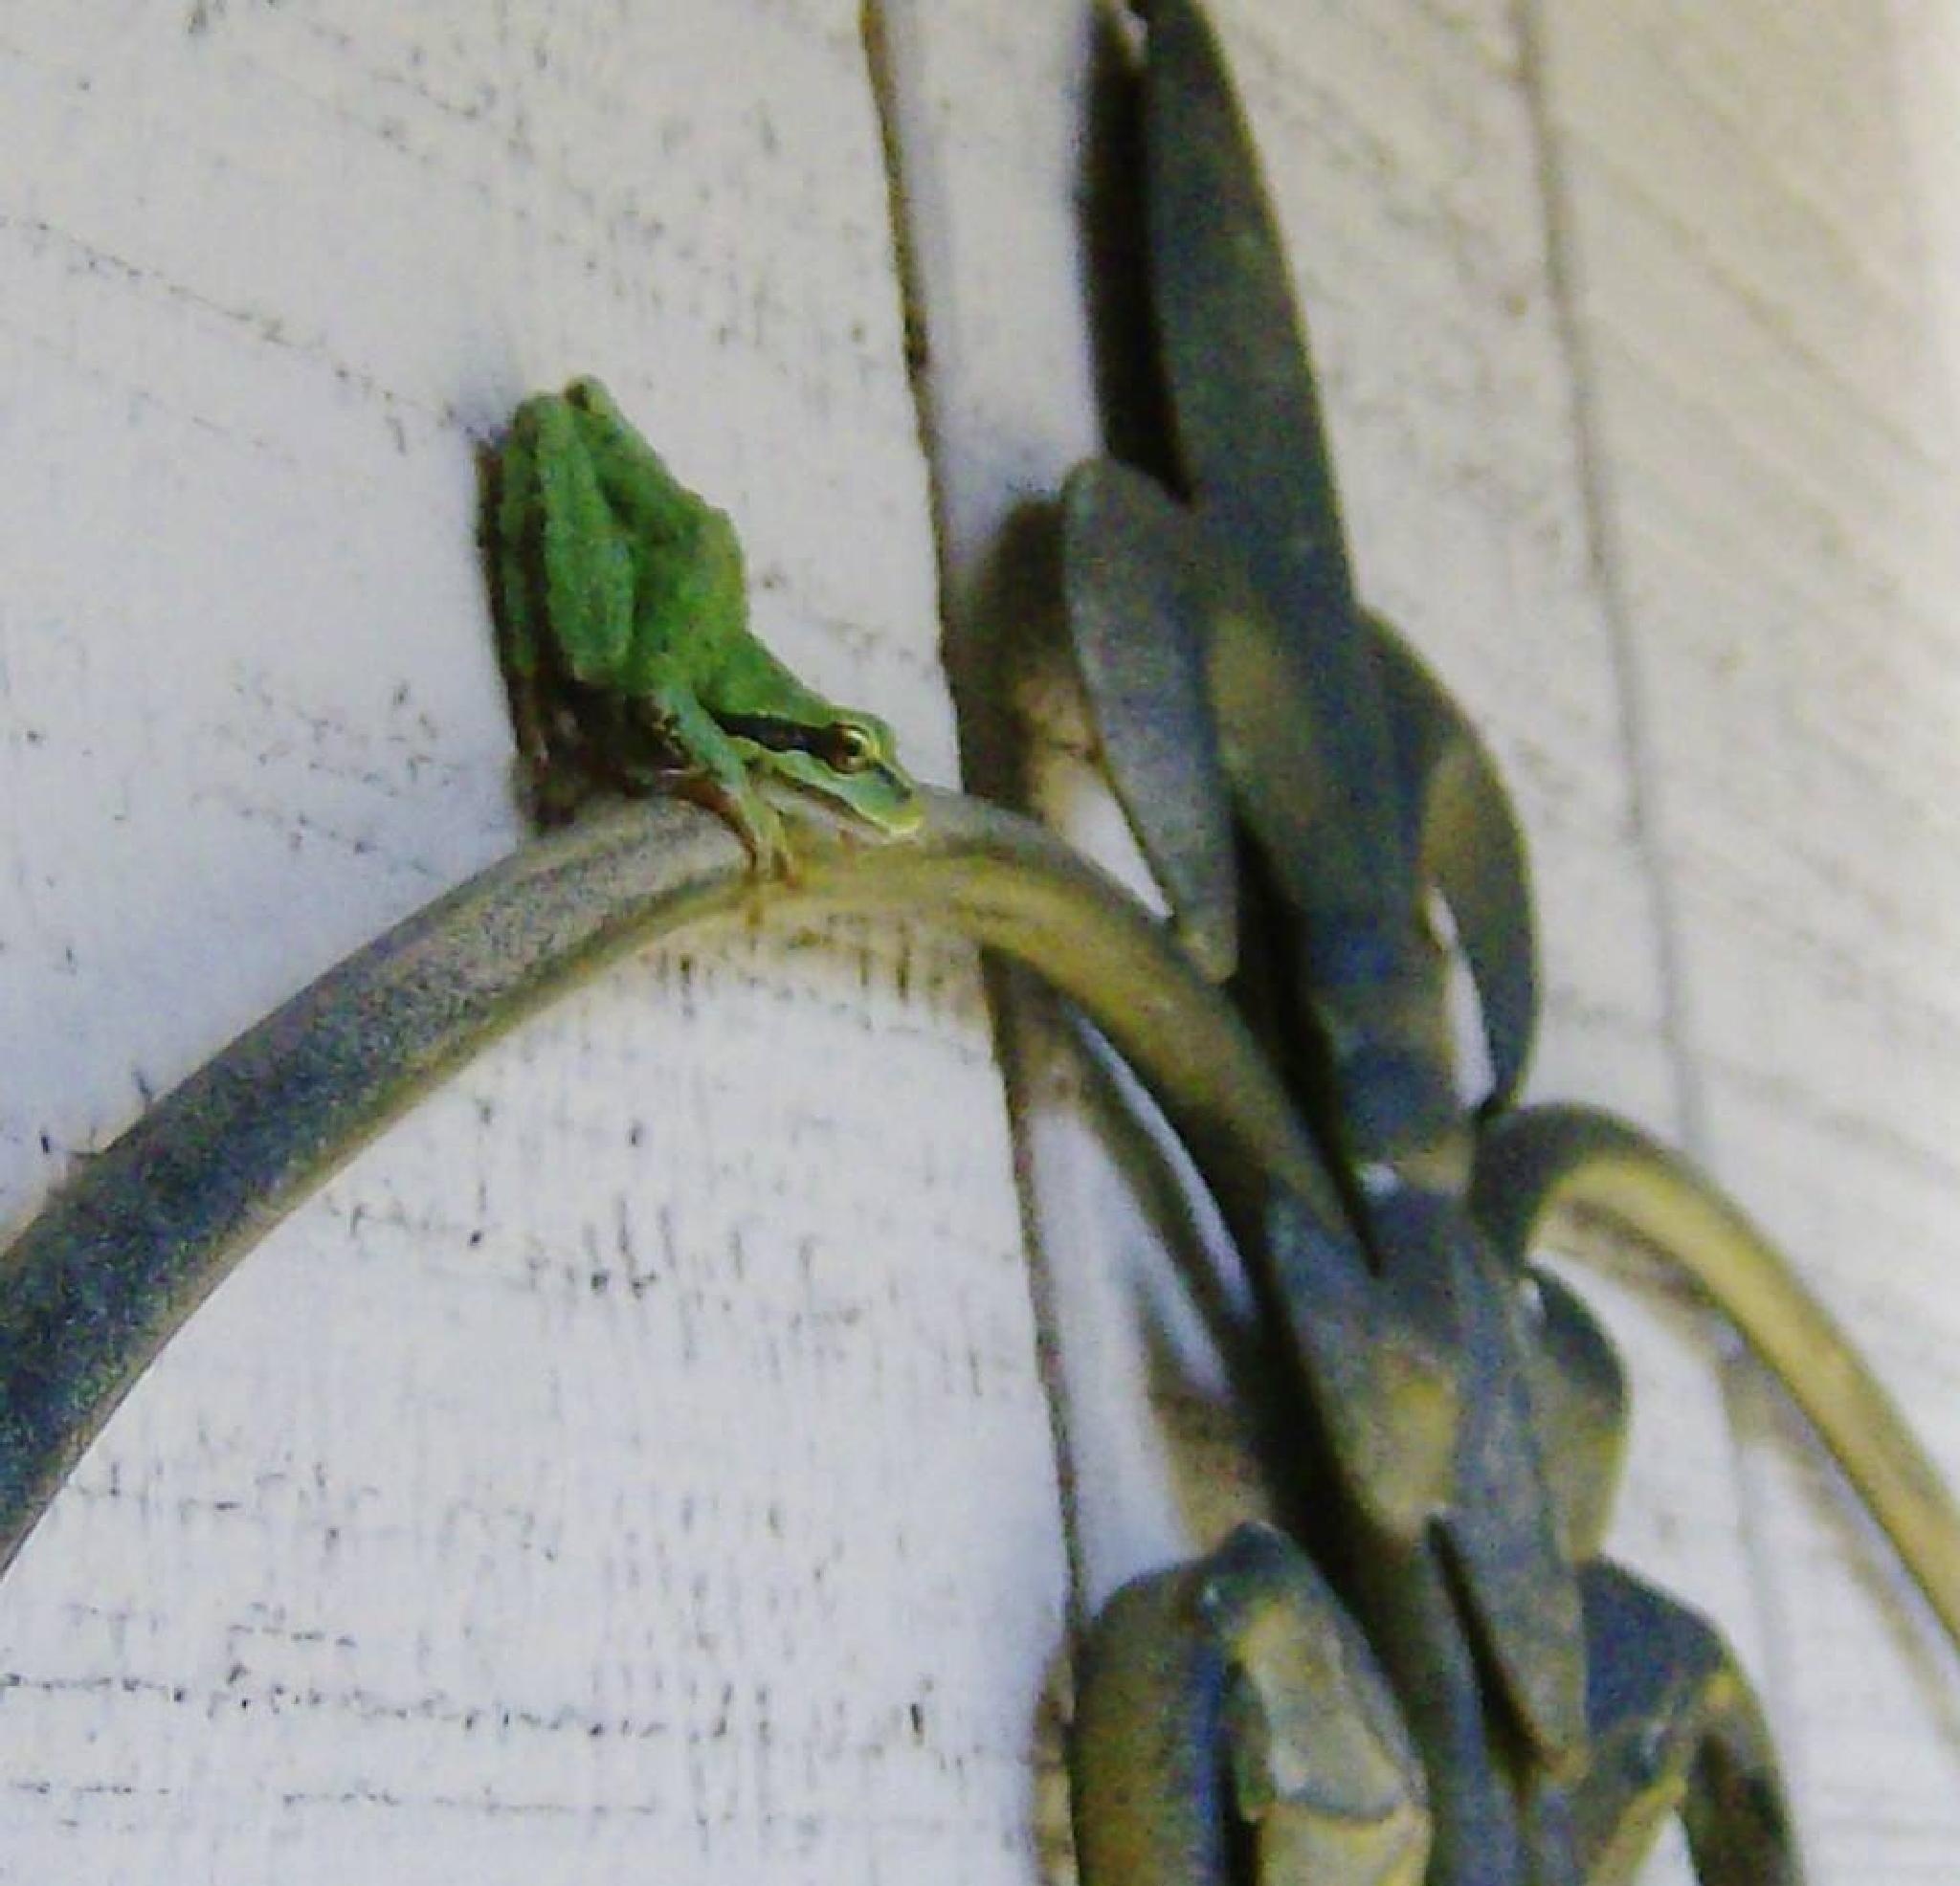 Tree frog by Dream Weavers Fotography